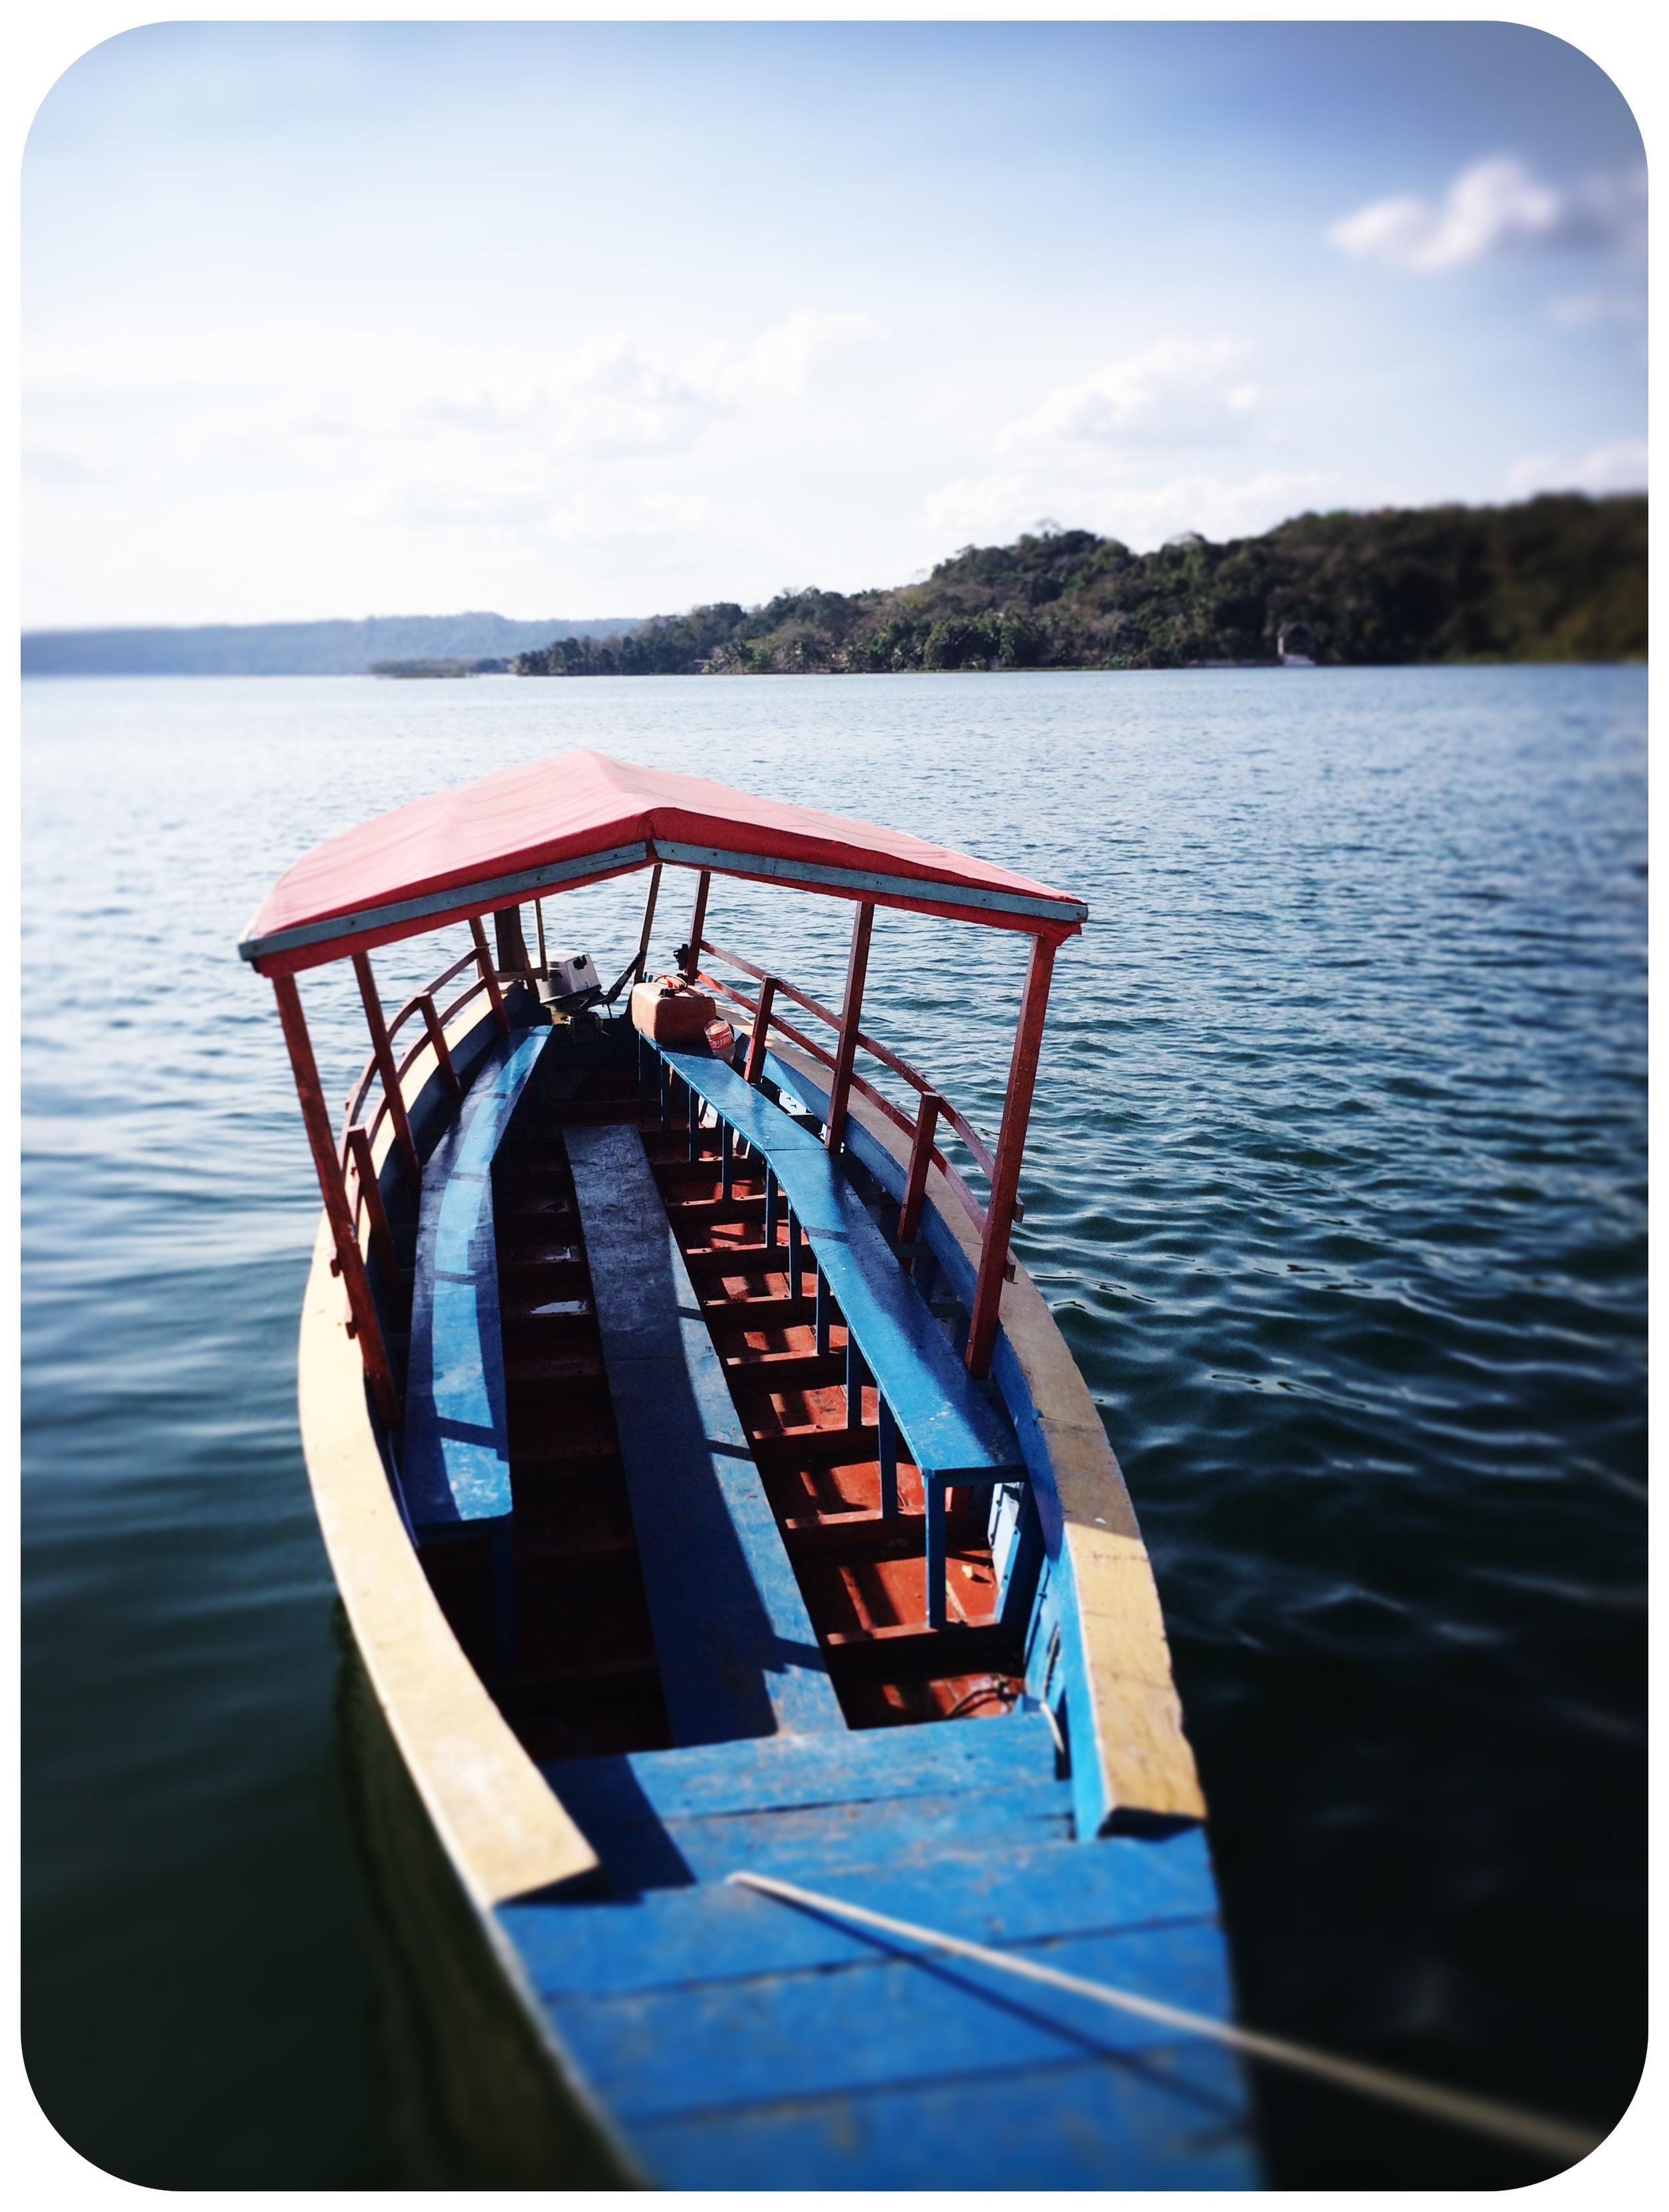 A launch awaits passengers on Guatemala's Lake Petén Itzá.   Photo by Michael Mundt